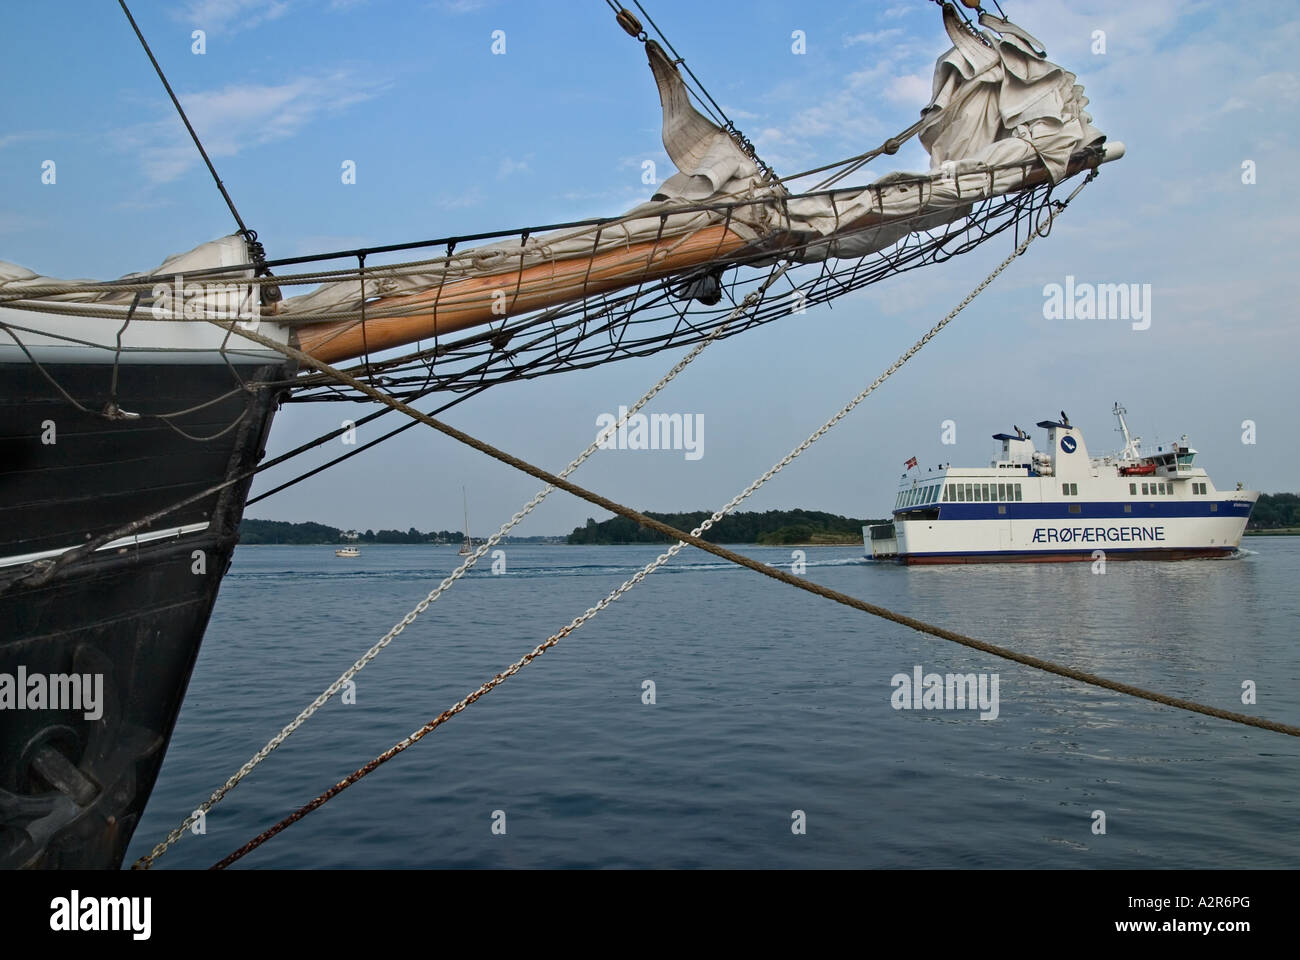 Old Sailing Ships in harbour Svendborg while a small island ferry leave Svendborg fyn Funen Denmark - Stock Image